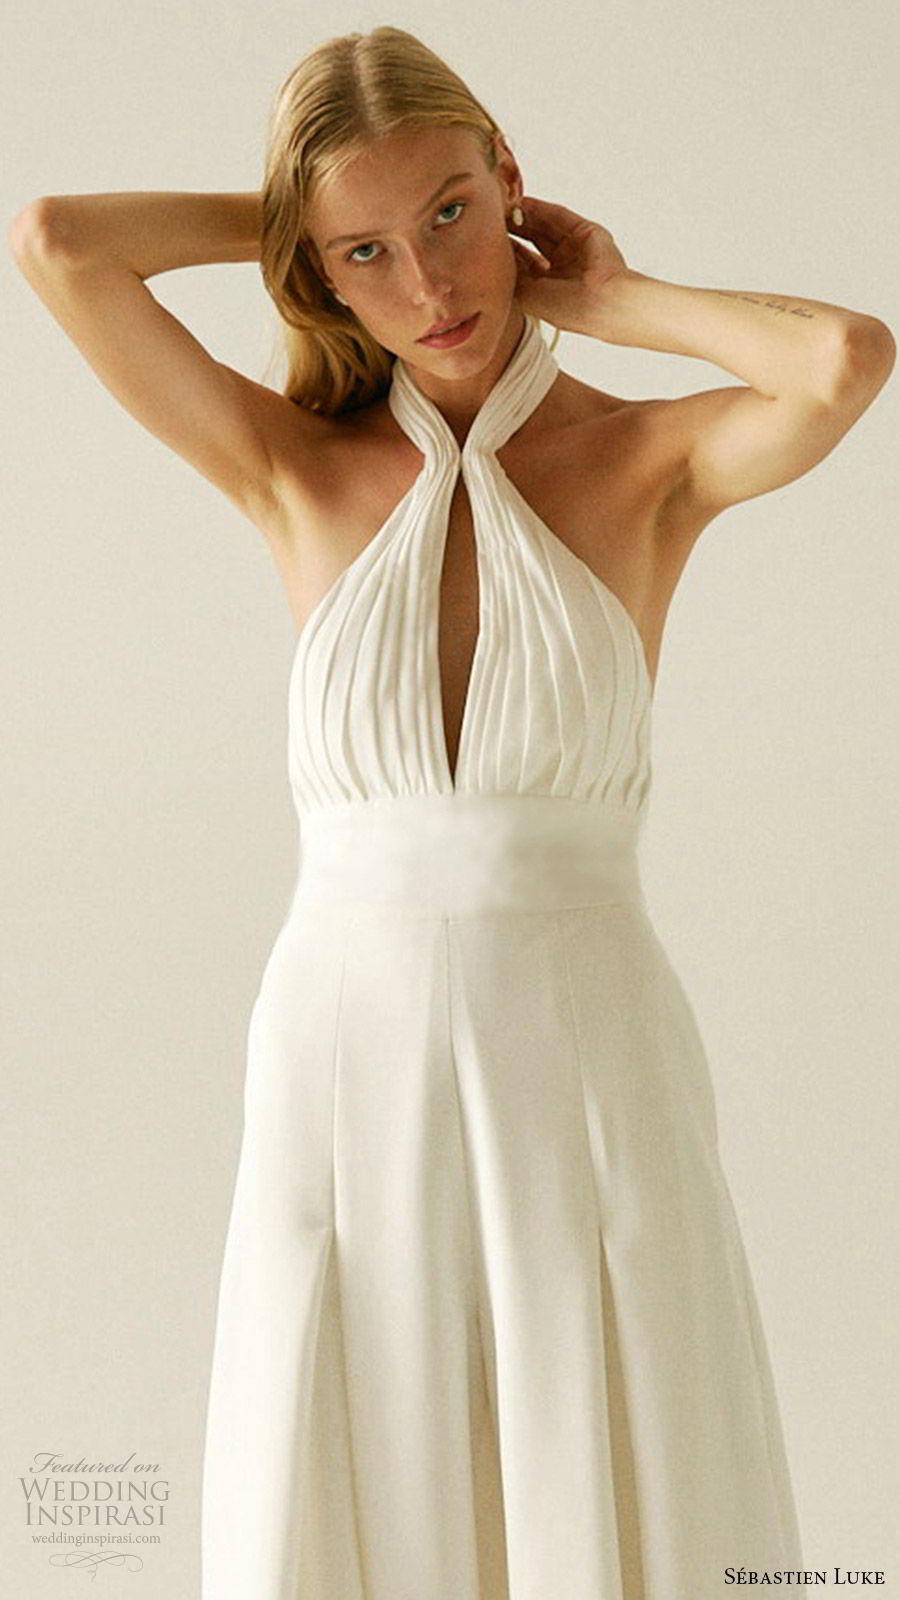 sebastien luke fall 2019 bridal sleeveless halter neckline keyhole ruched bodice pant suit wedding dress pockets (6) zv